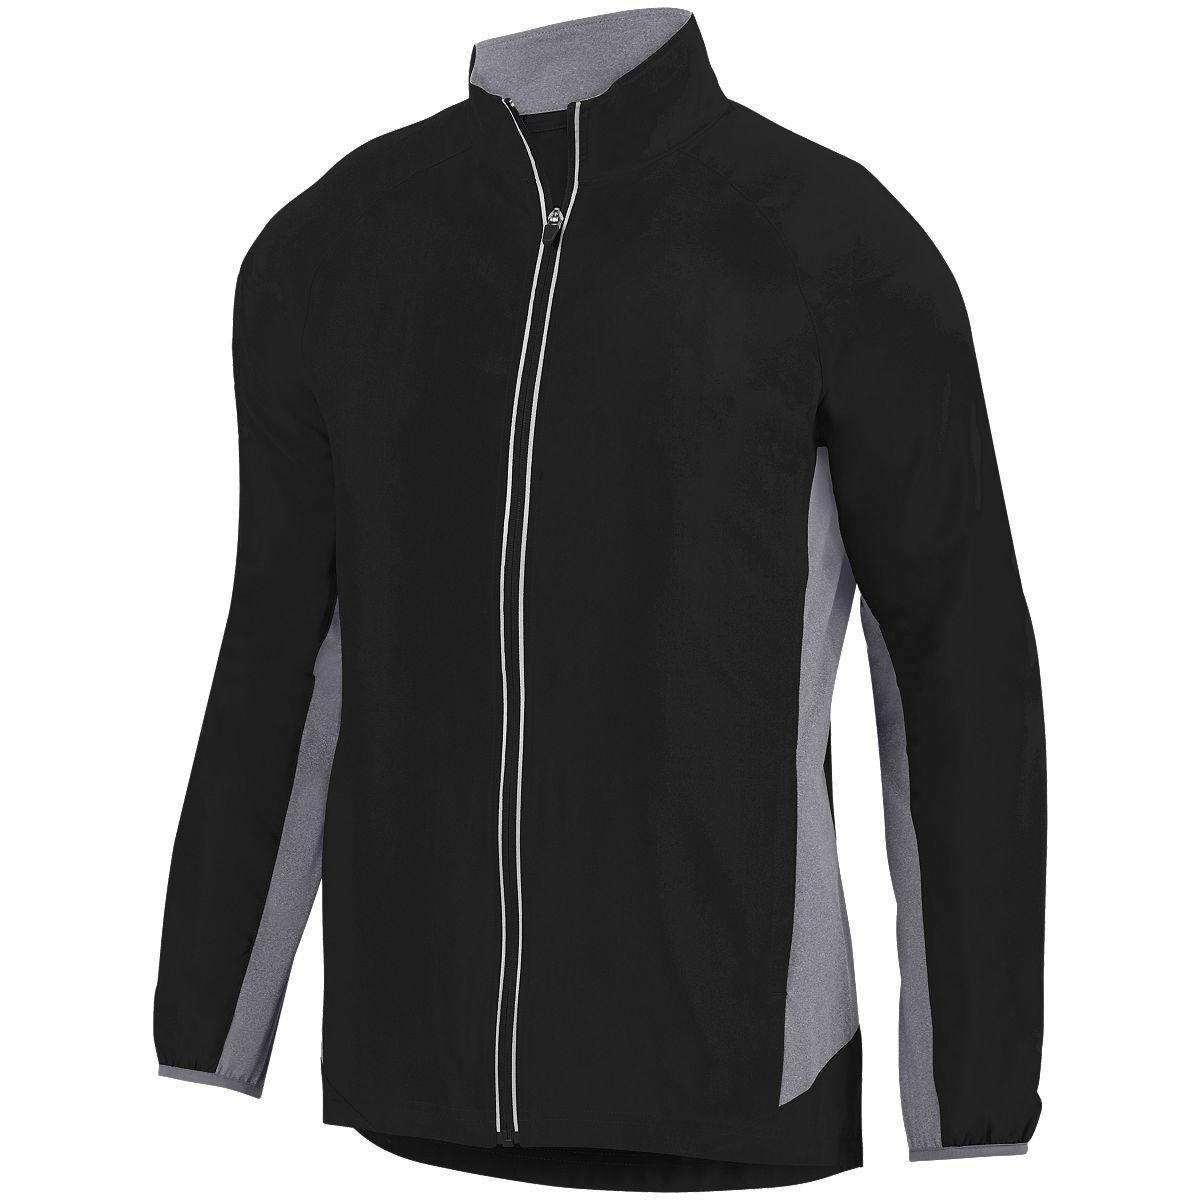 Youth Preeminent Jacket - BLACK/GRAPHITE HEATHER